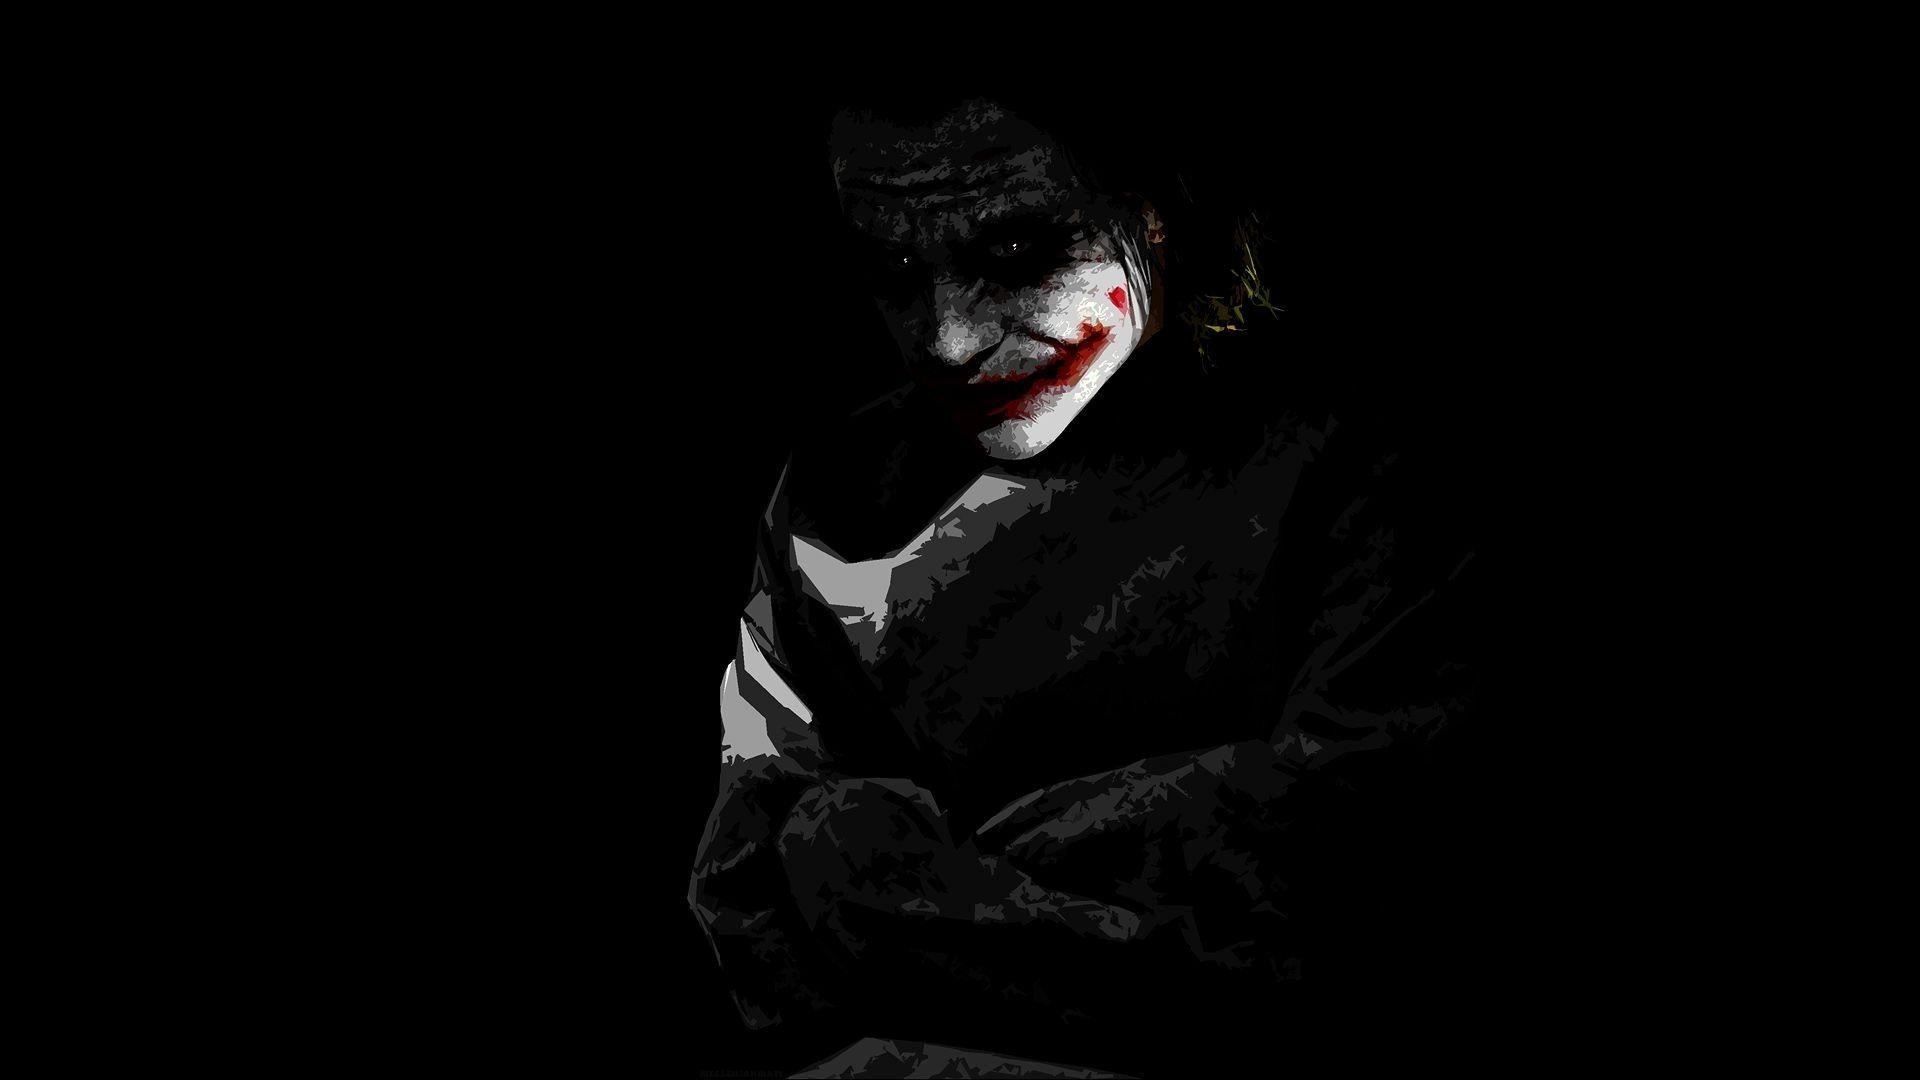 Hd Joker Wallpaper For Iphone Joker Hd Wallpaper Joker Wallpapers Batman Joker Wallpaper